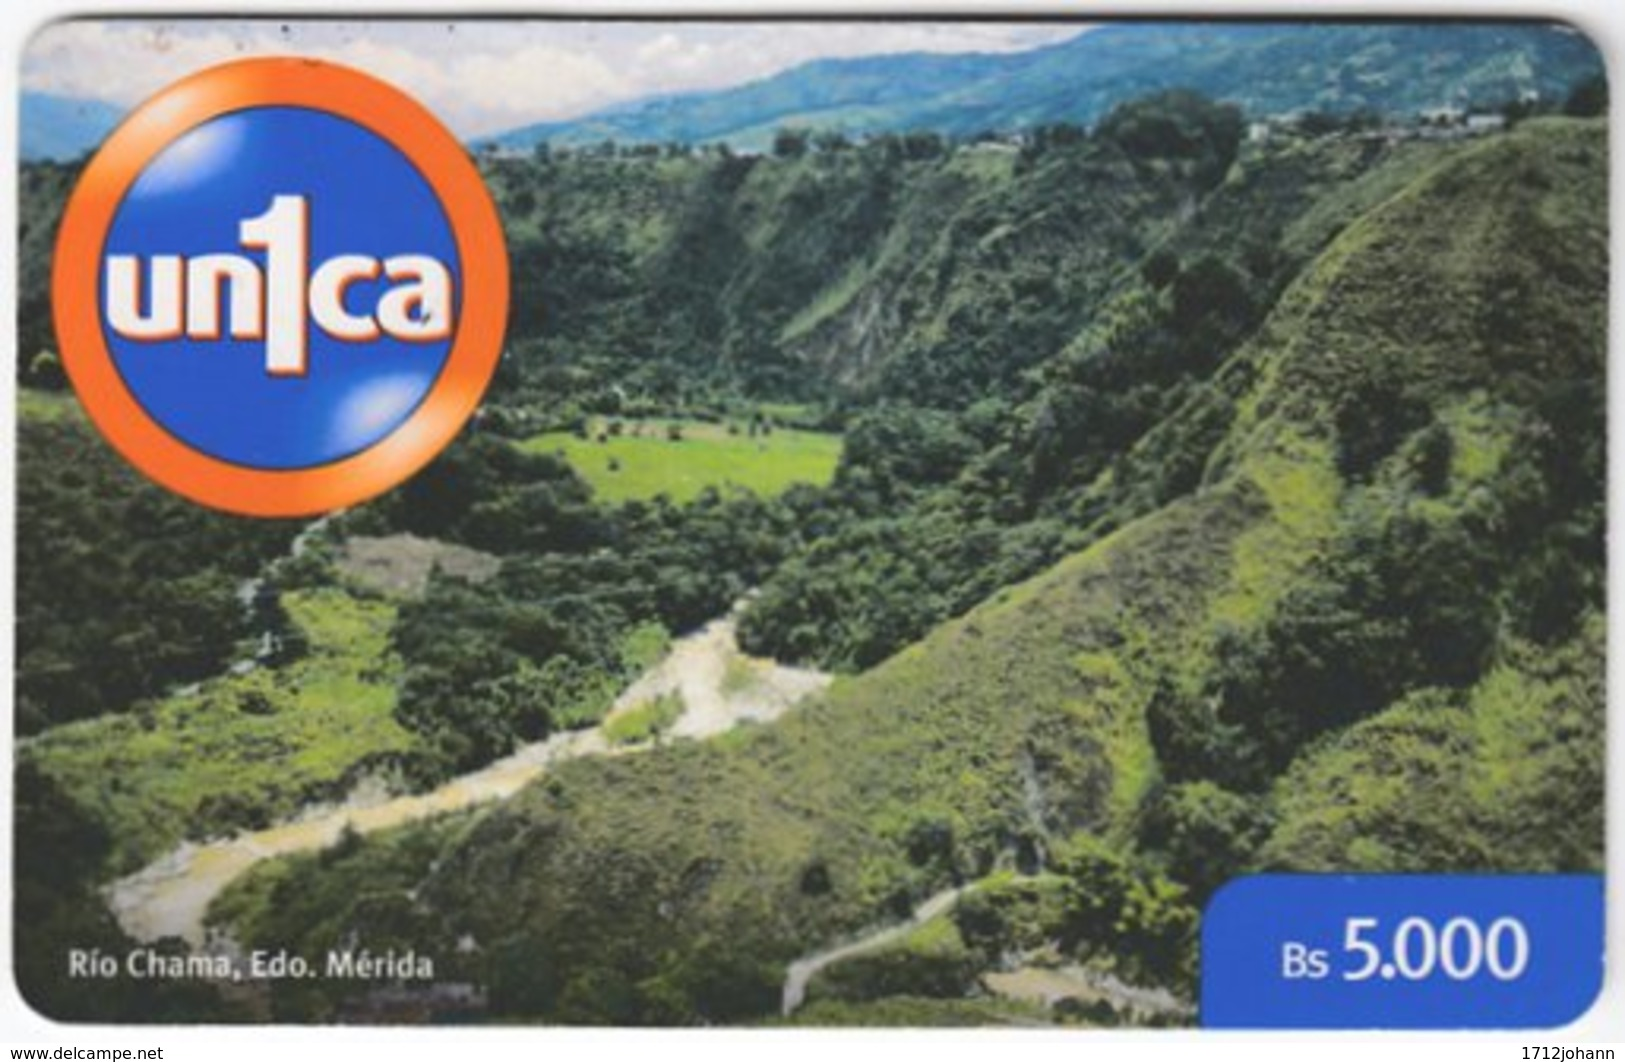 VENEZUELA A-997 Prepaid Un1ca - Landscape, Mountain - Used - Venezuela